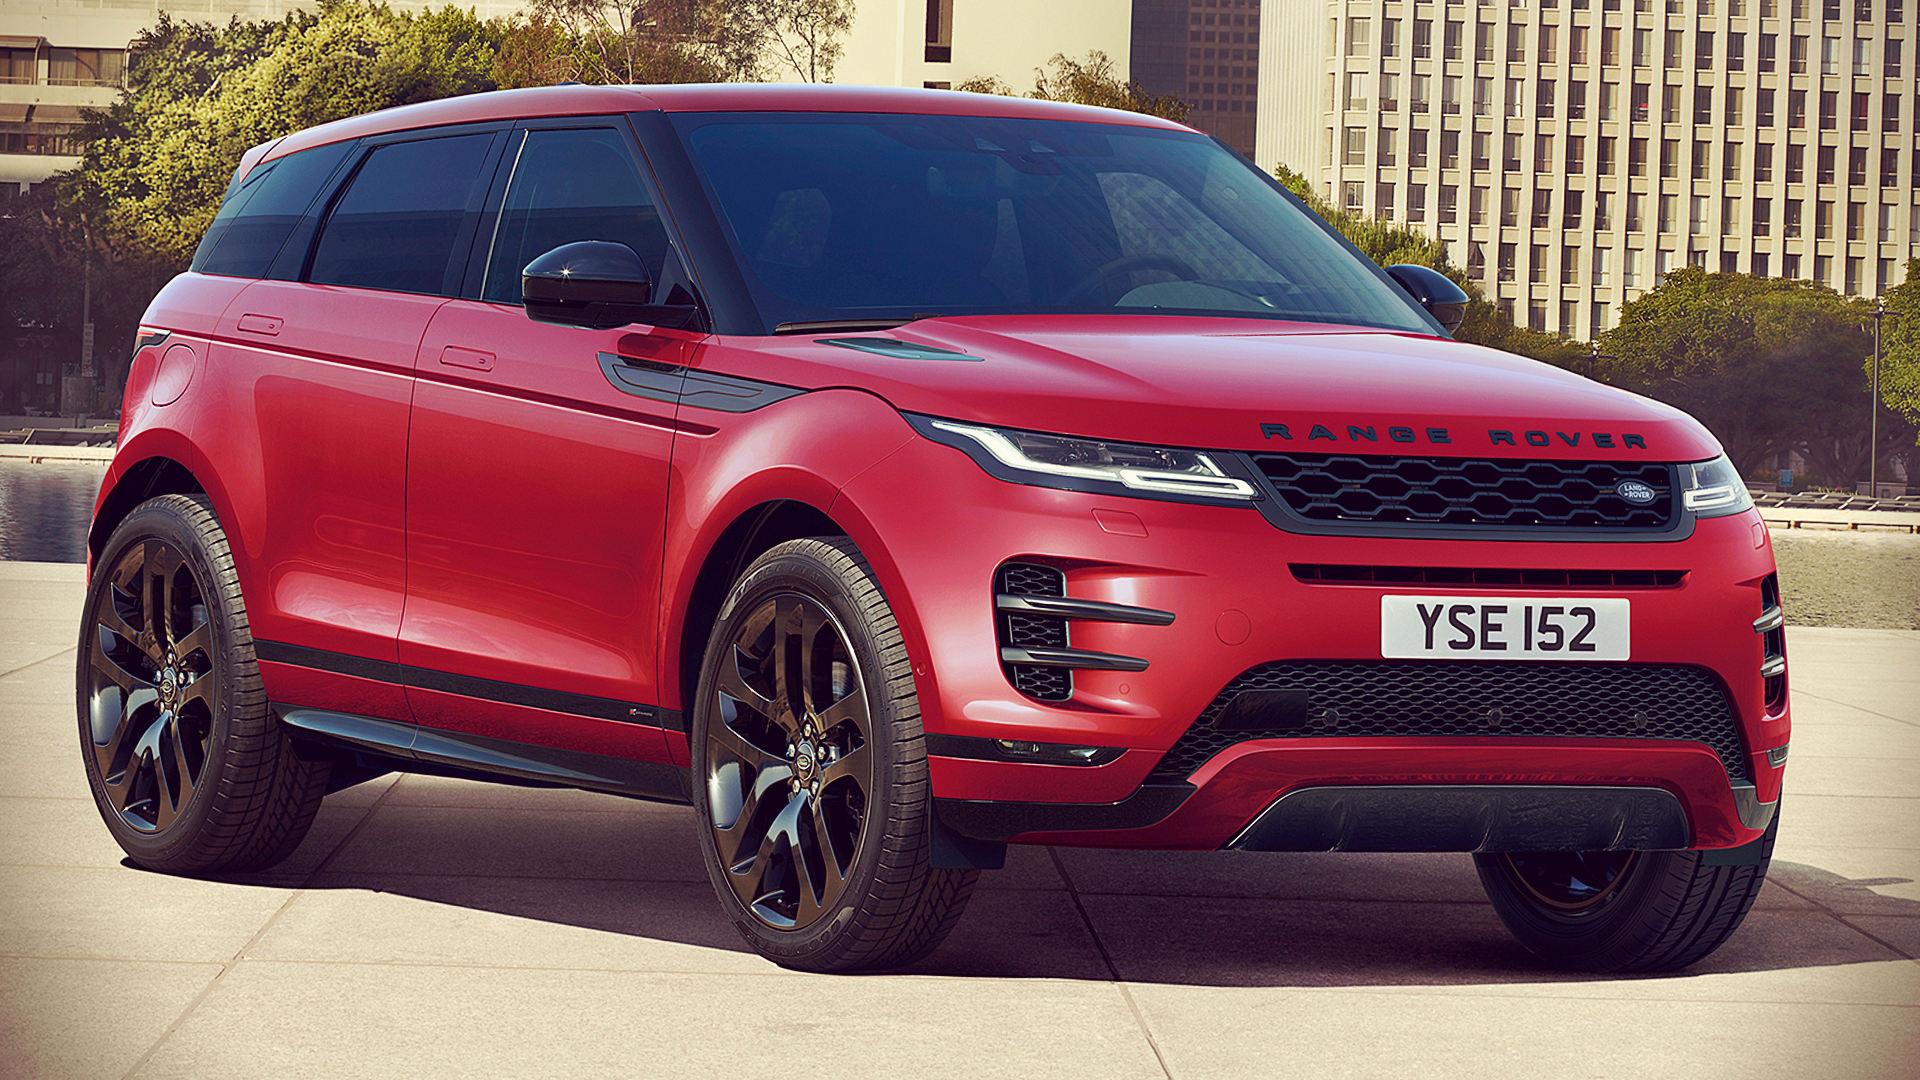 2020 Range Rover Evoque Red Black Pack